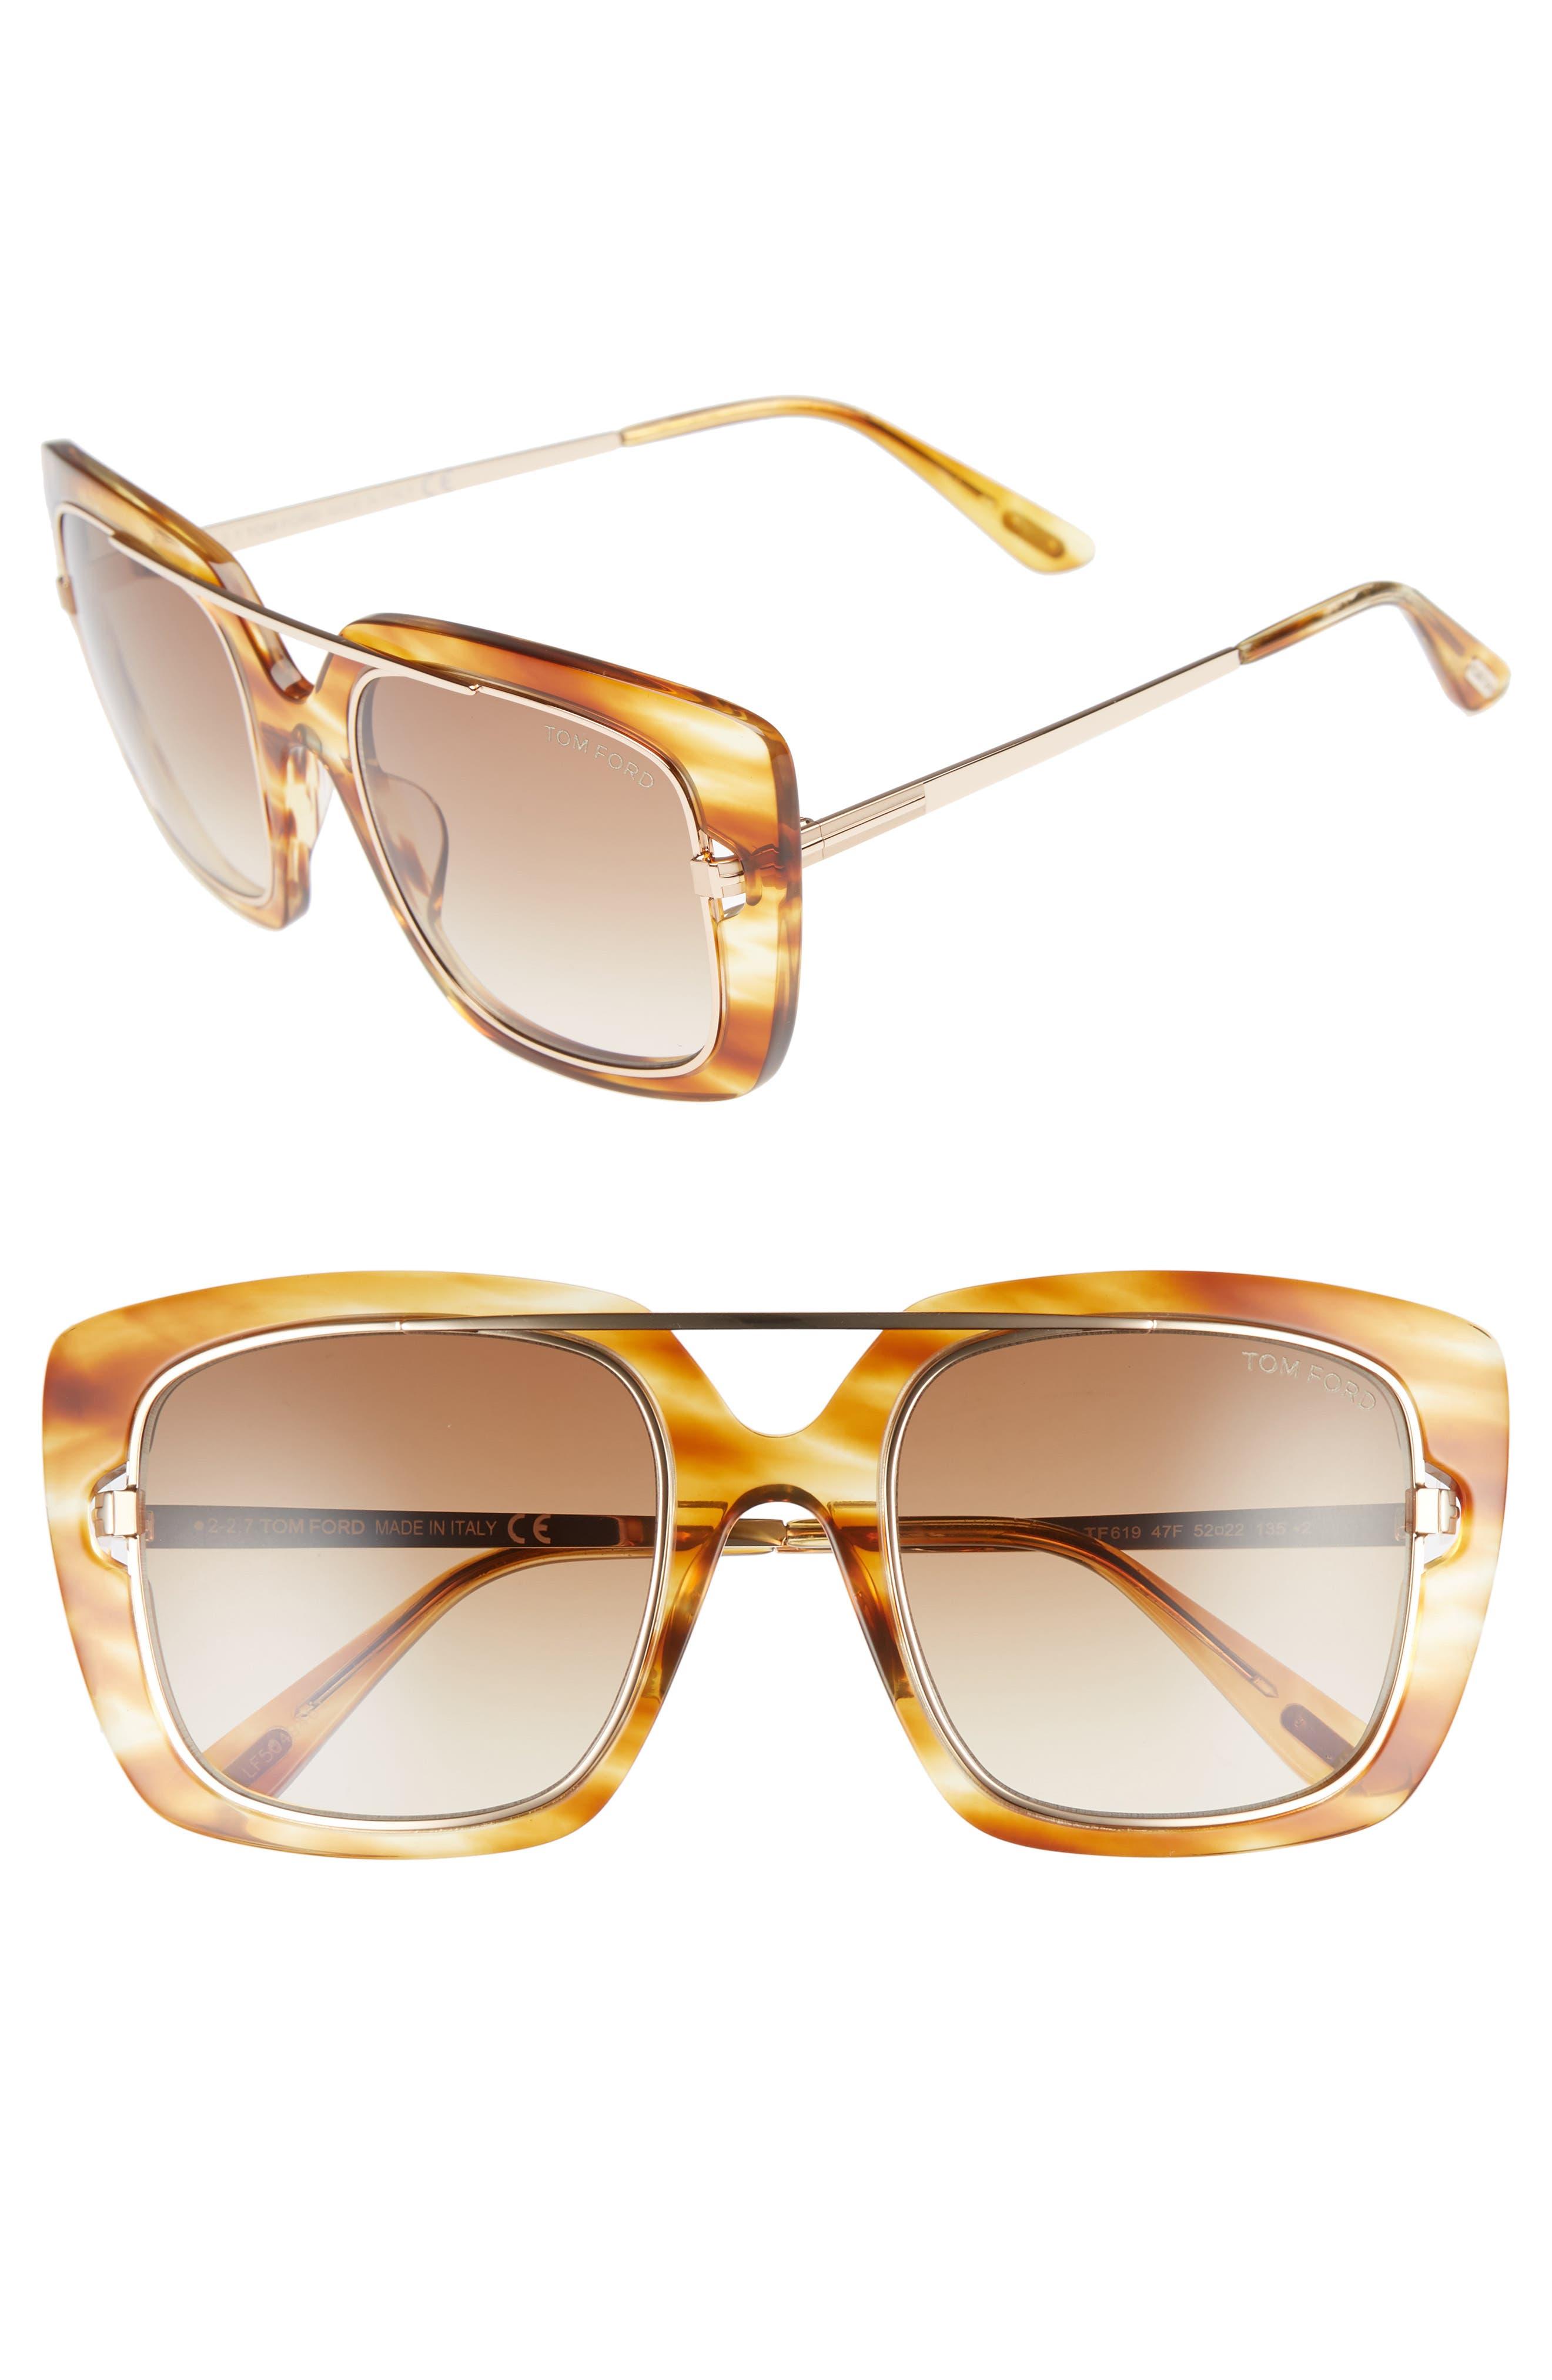 Marissa 52mm Sunglasses,                             Main thumbnail 1, color,                             LIGHT BROWN/ GRADIENT BROWN